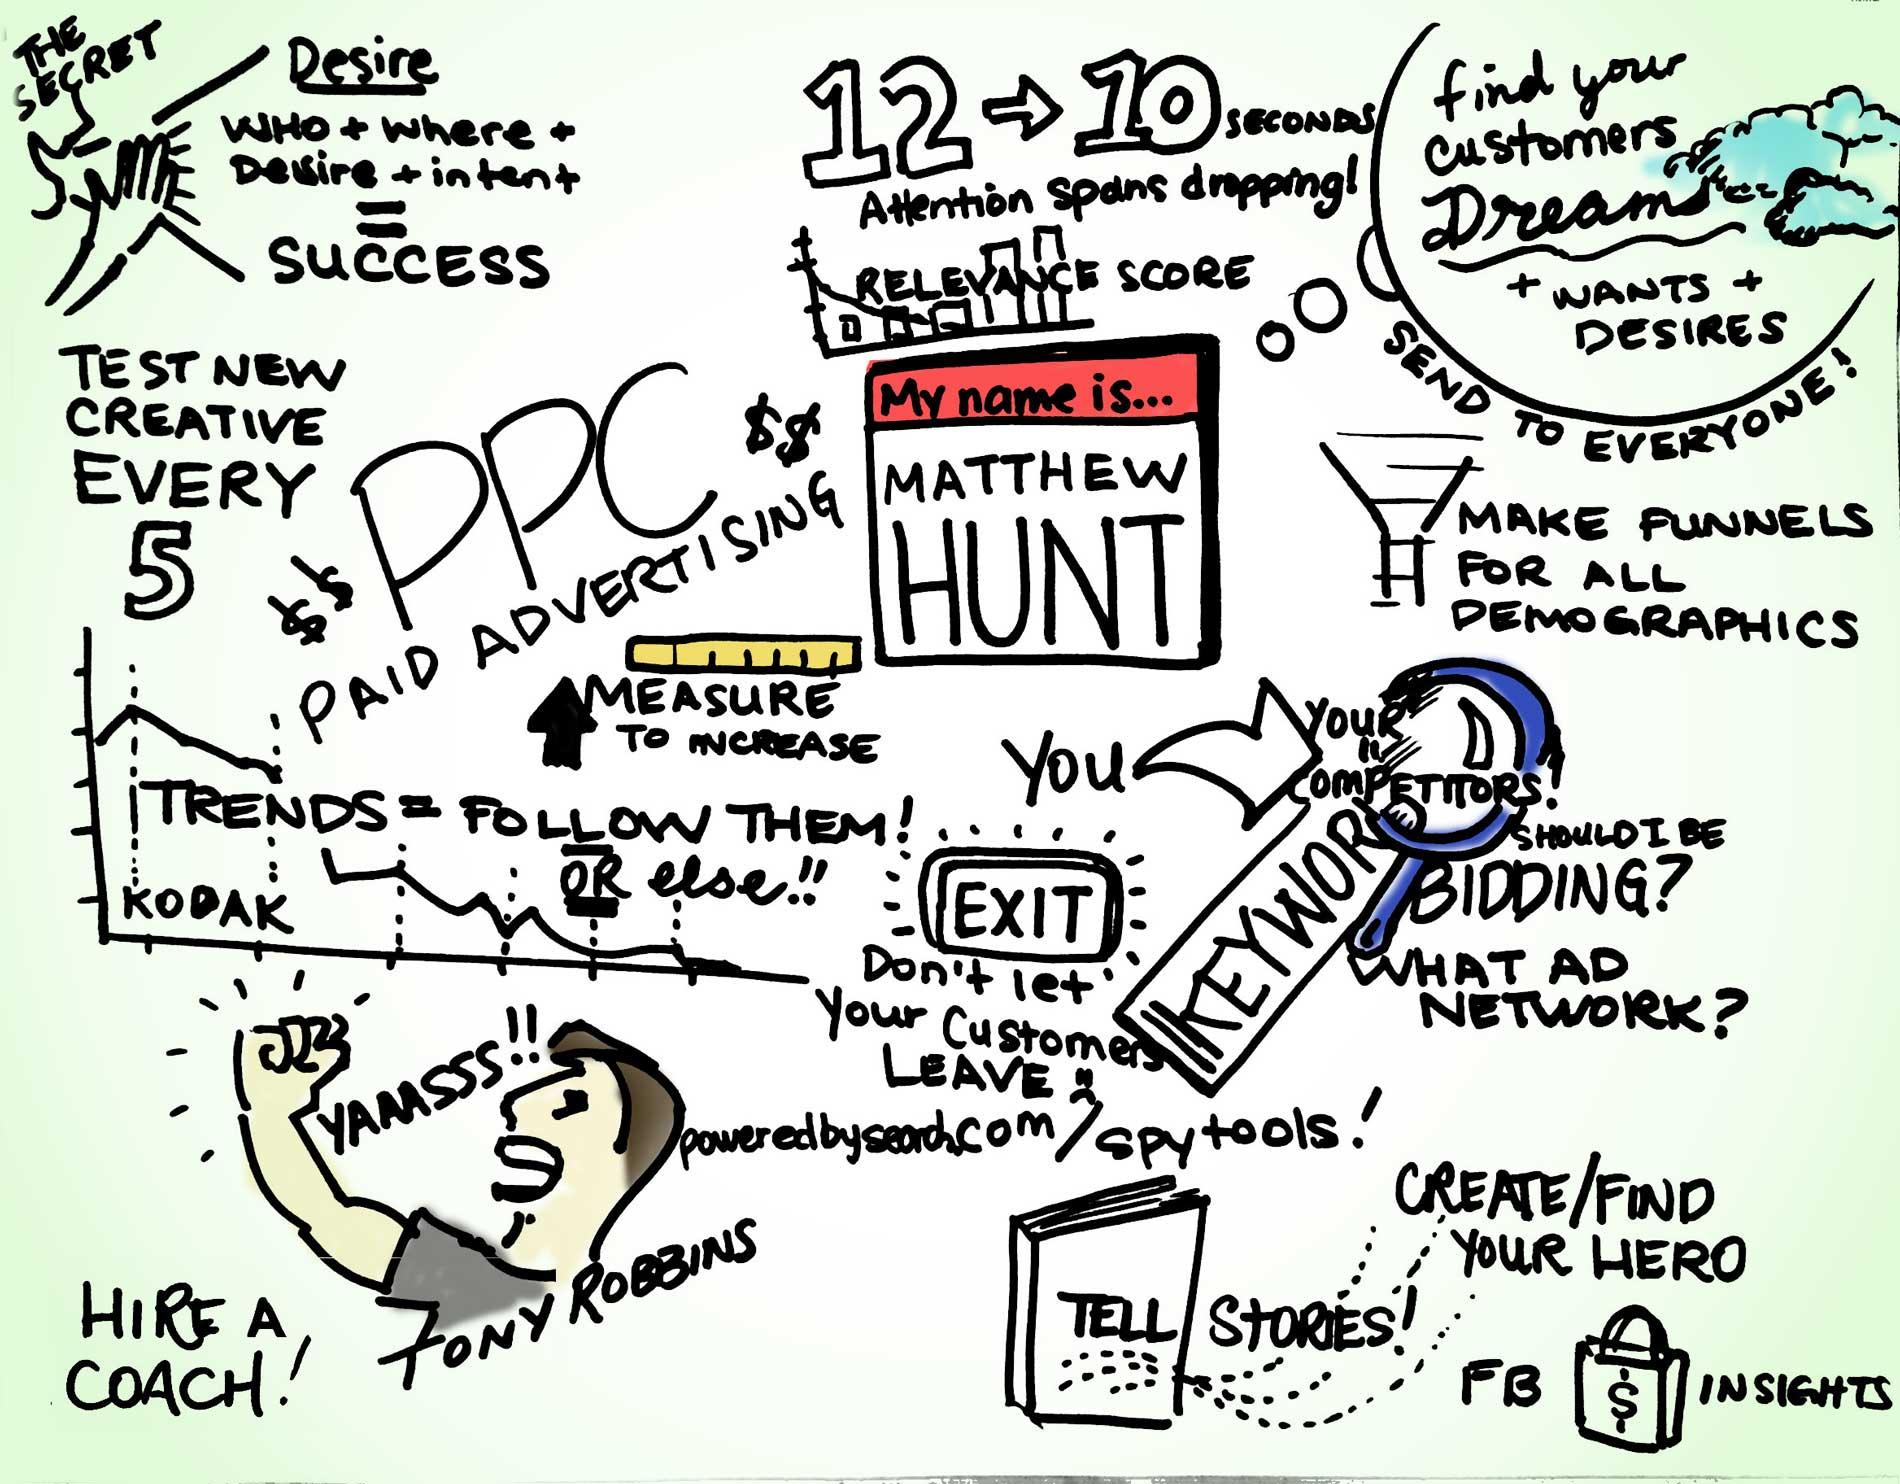 Matthew Hunt inboundcon presentation